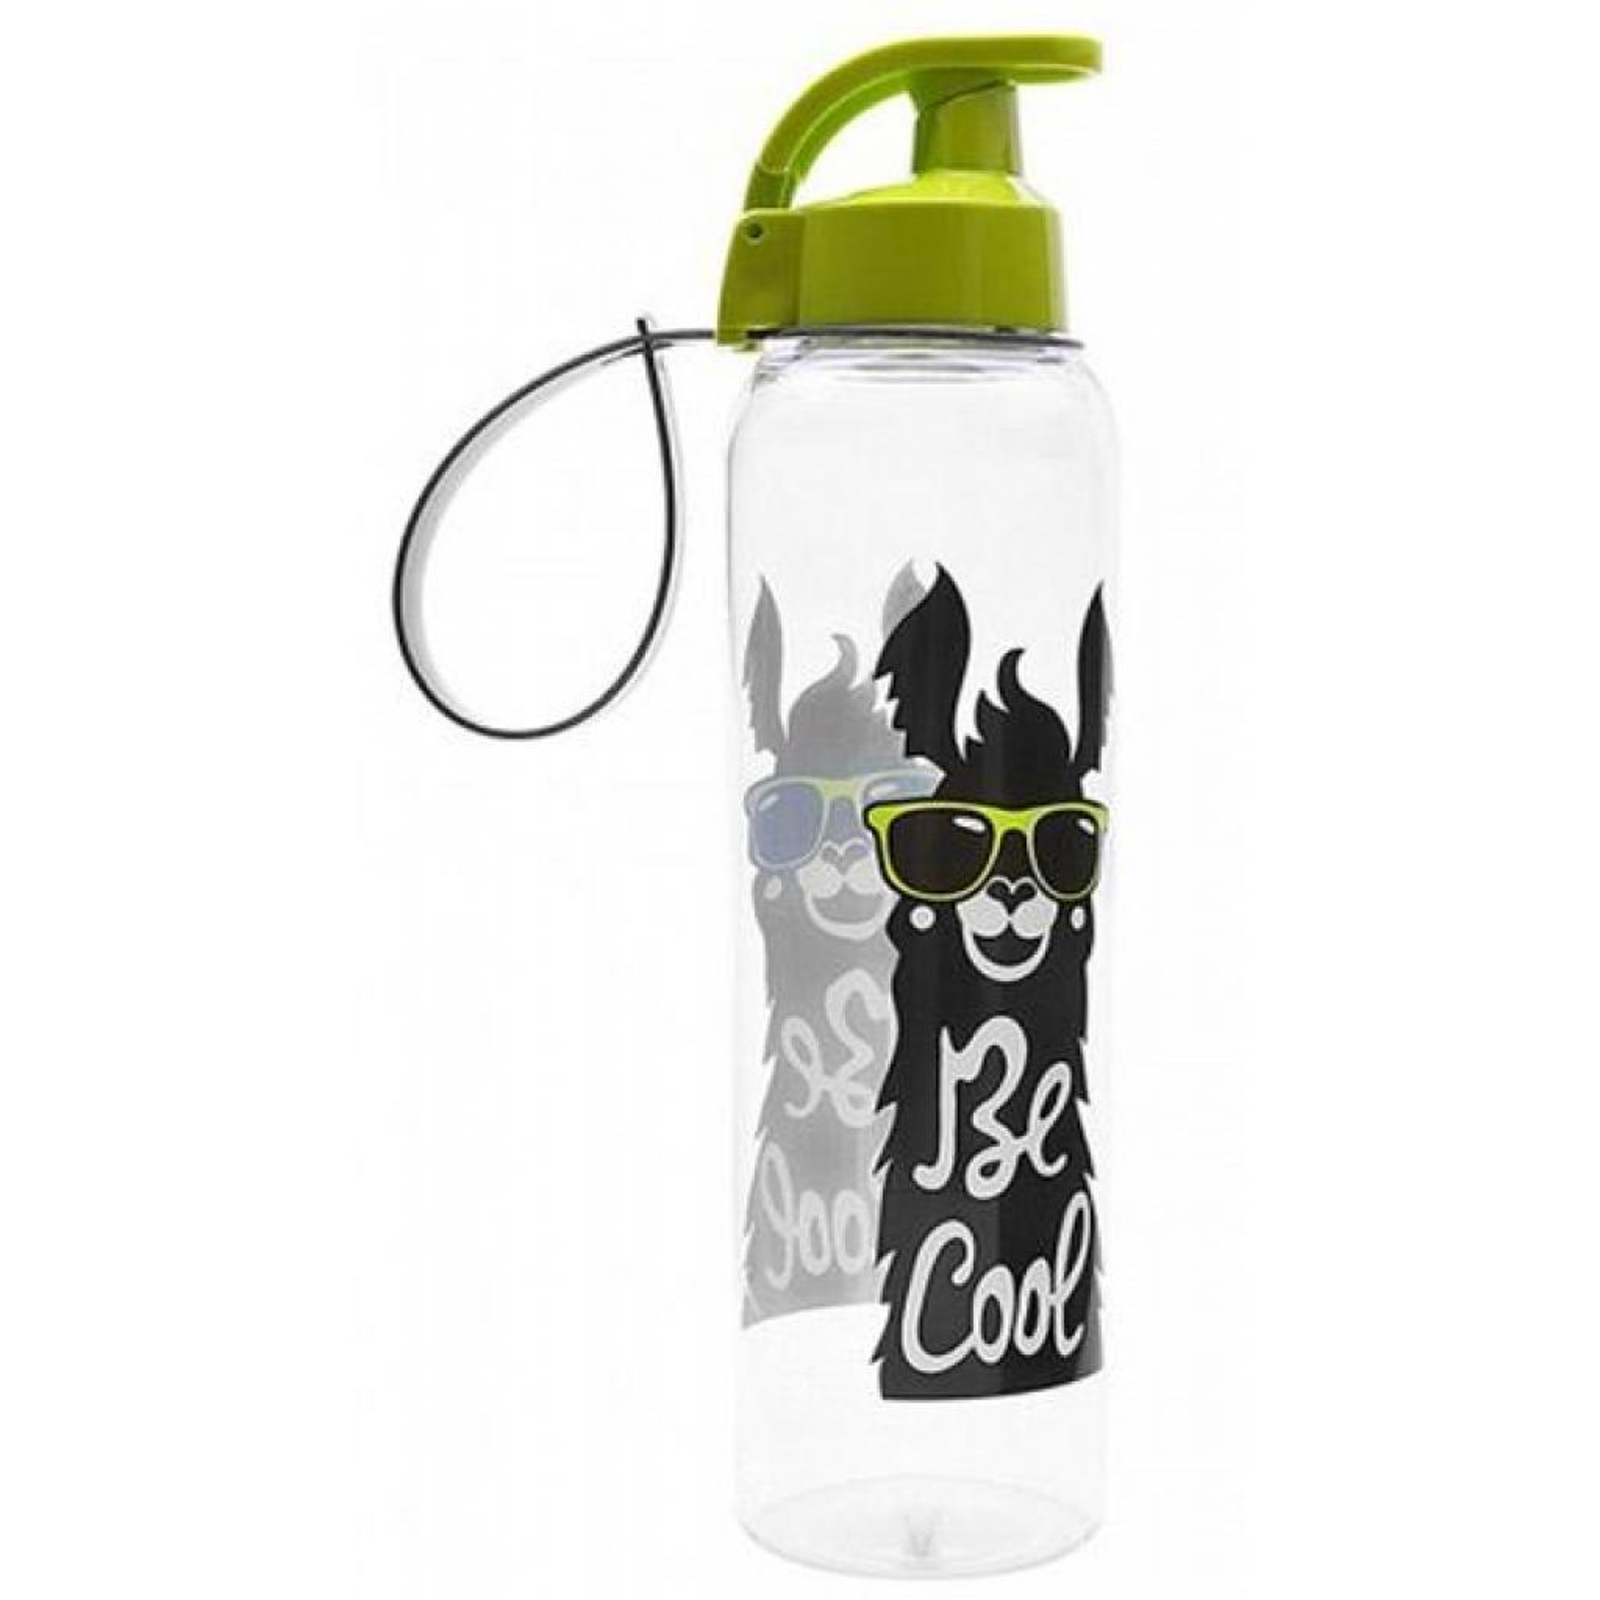 Бутылка для воды Herevin BE COOL 0.5 л (161415-160) изображение 2